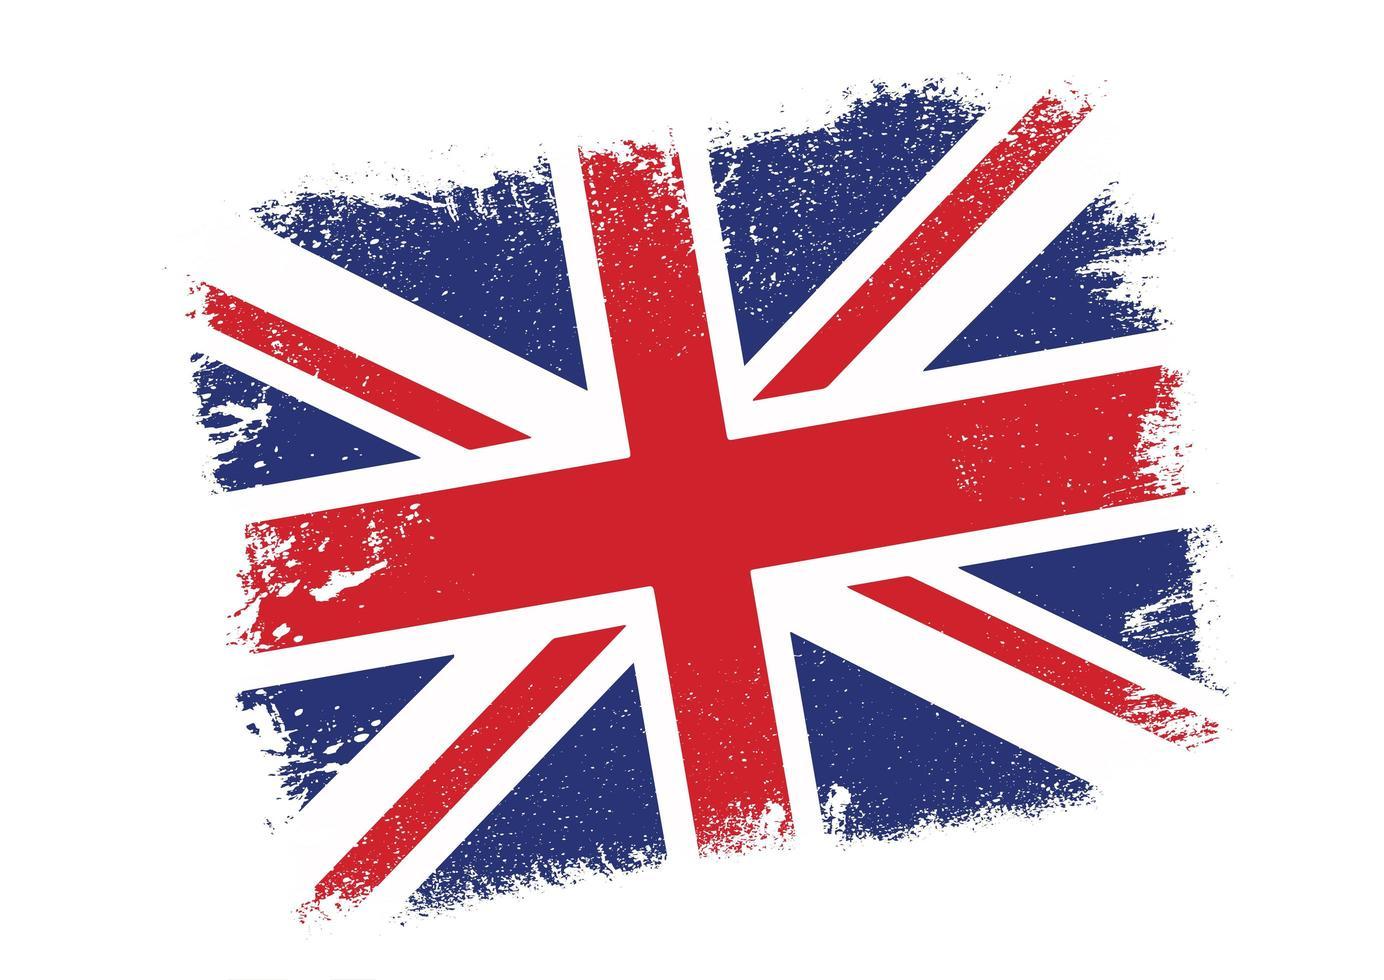 Grunge Union Jack flag - Download Free Vectors, Clipart ...